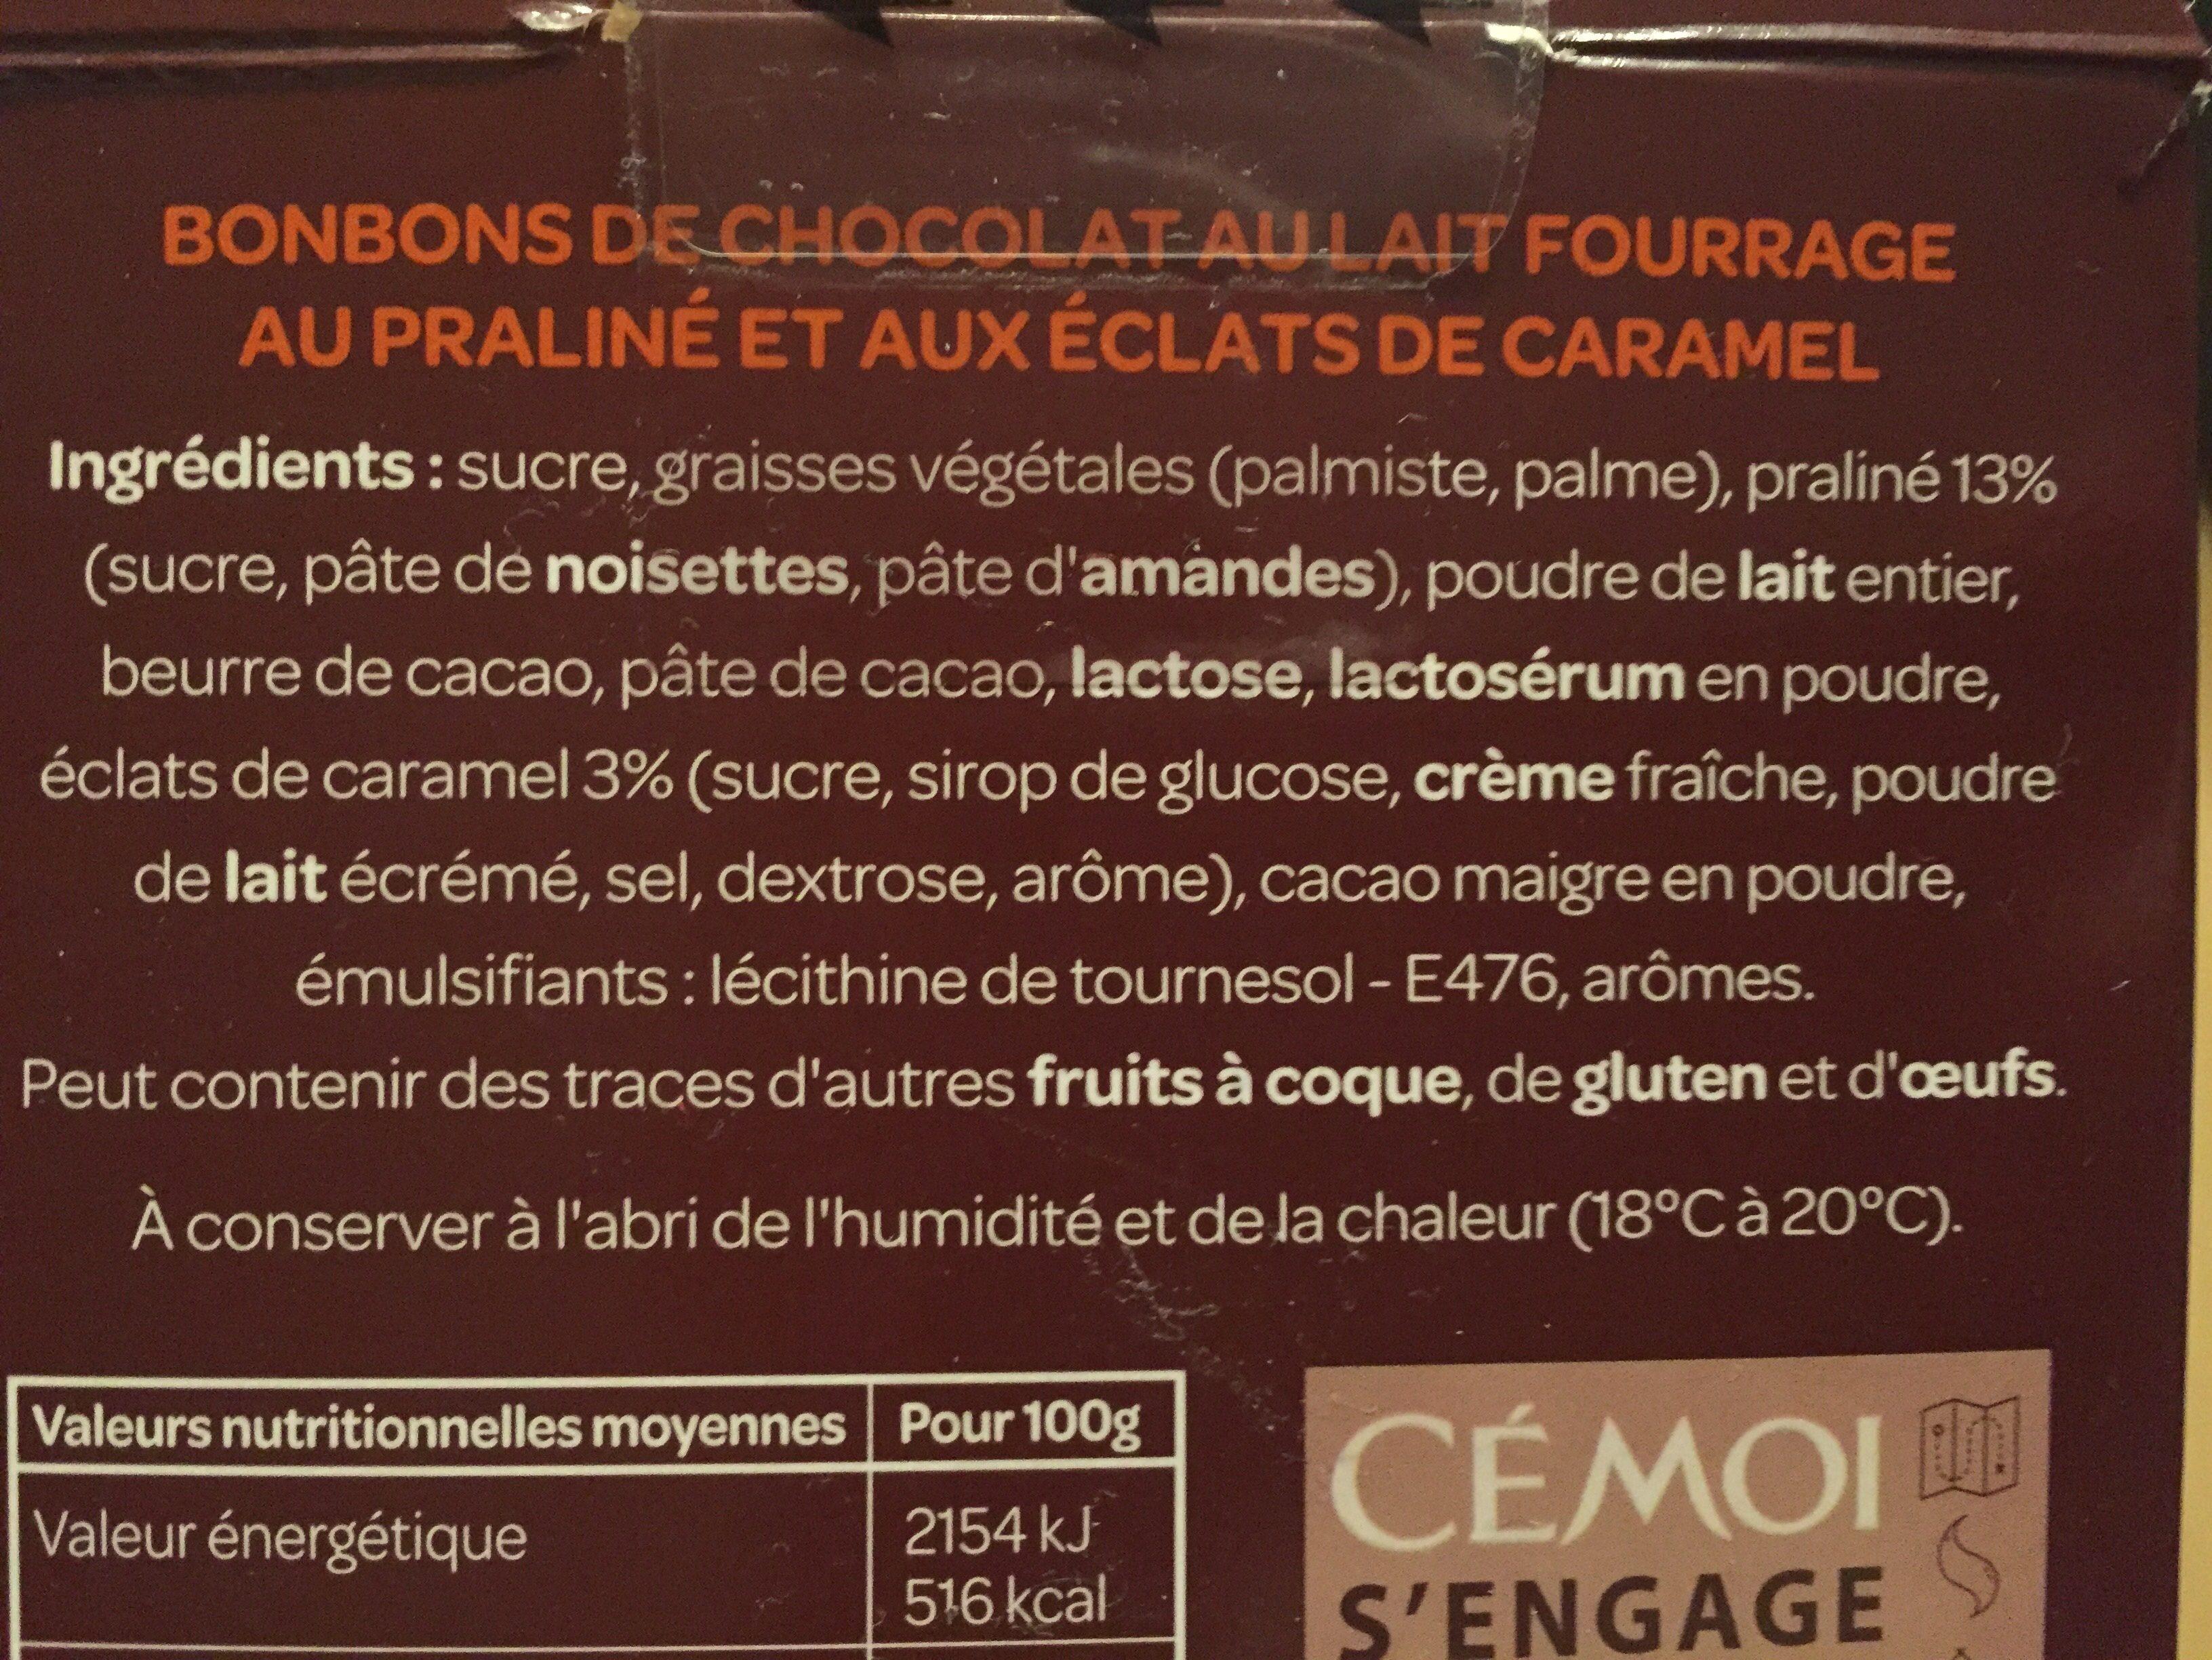 Bonbons œuf praliné caramel - Ingredients